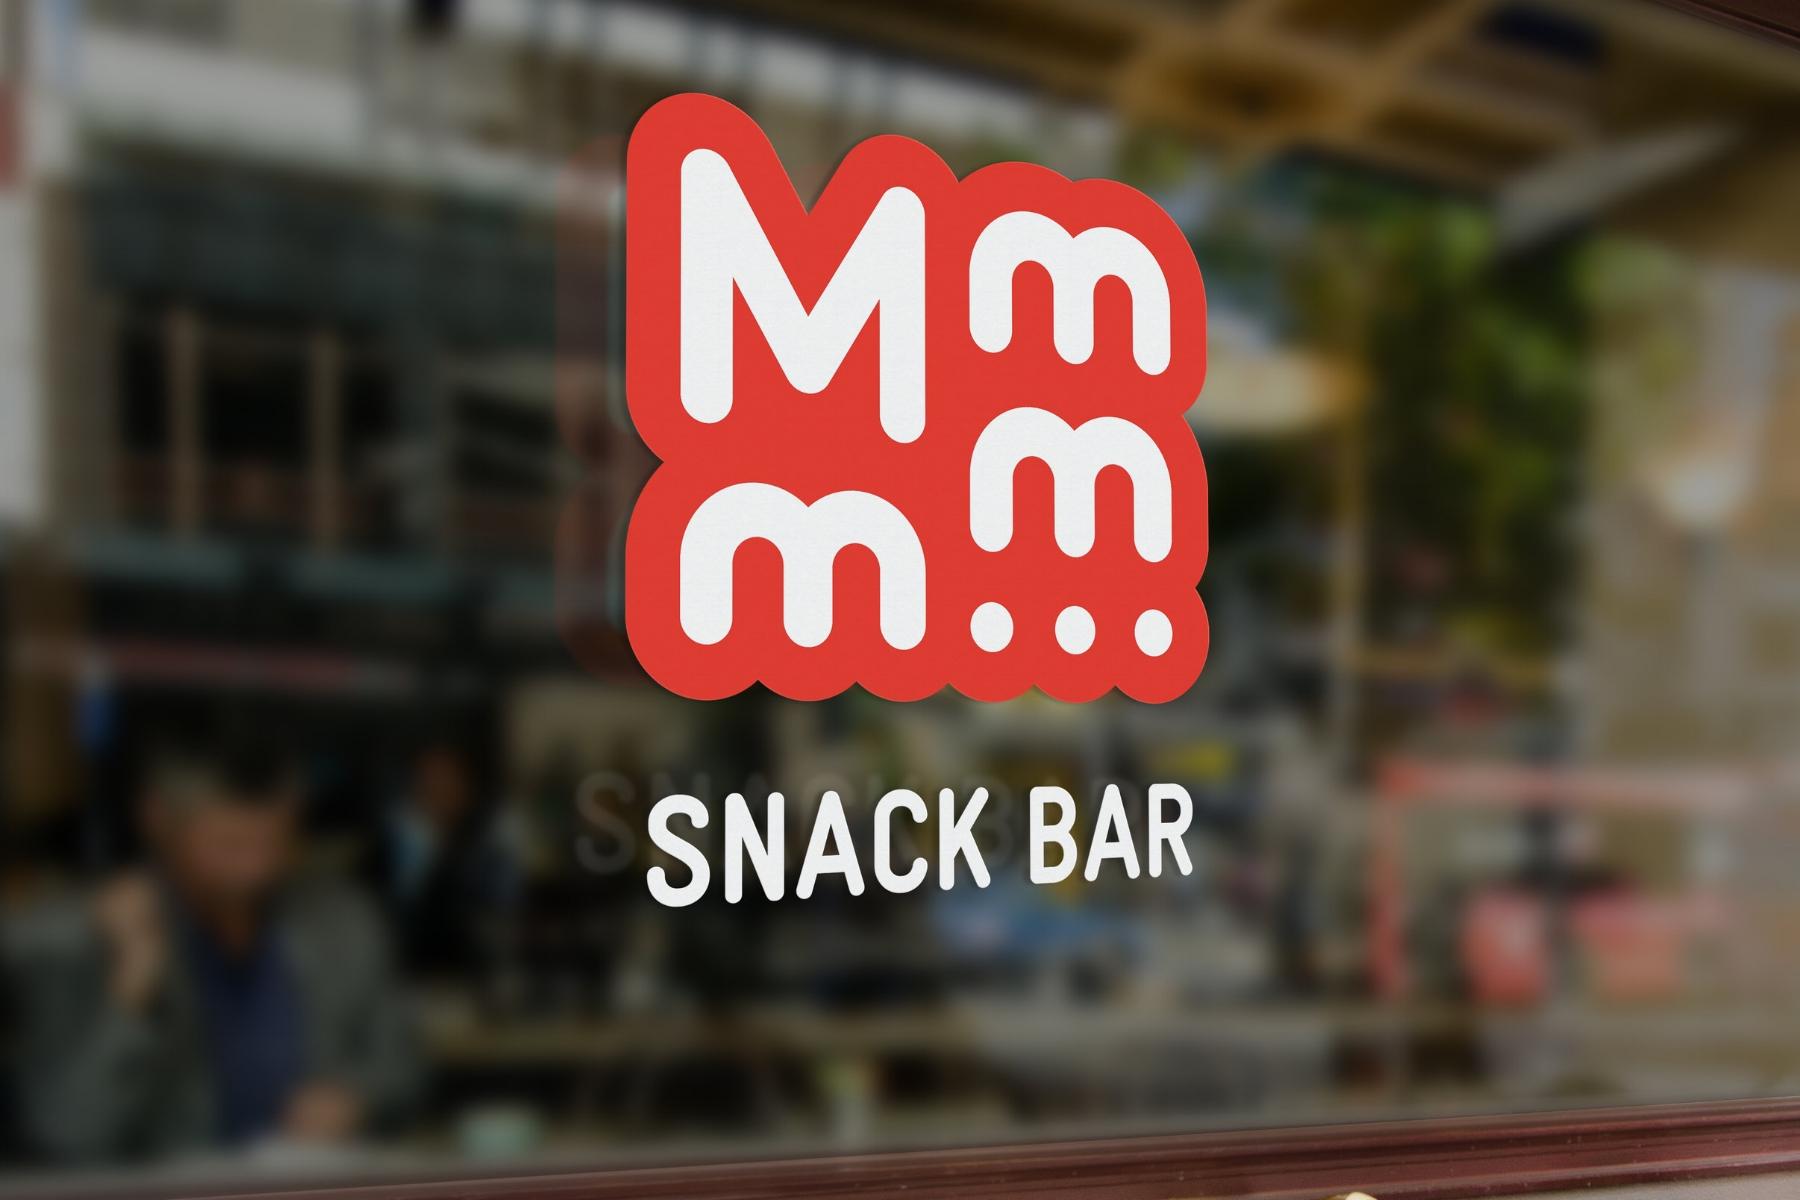 Mmmm... Snack Bar